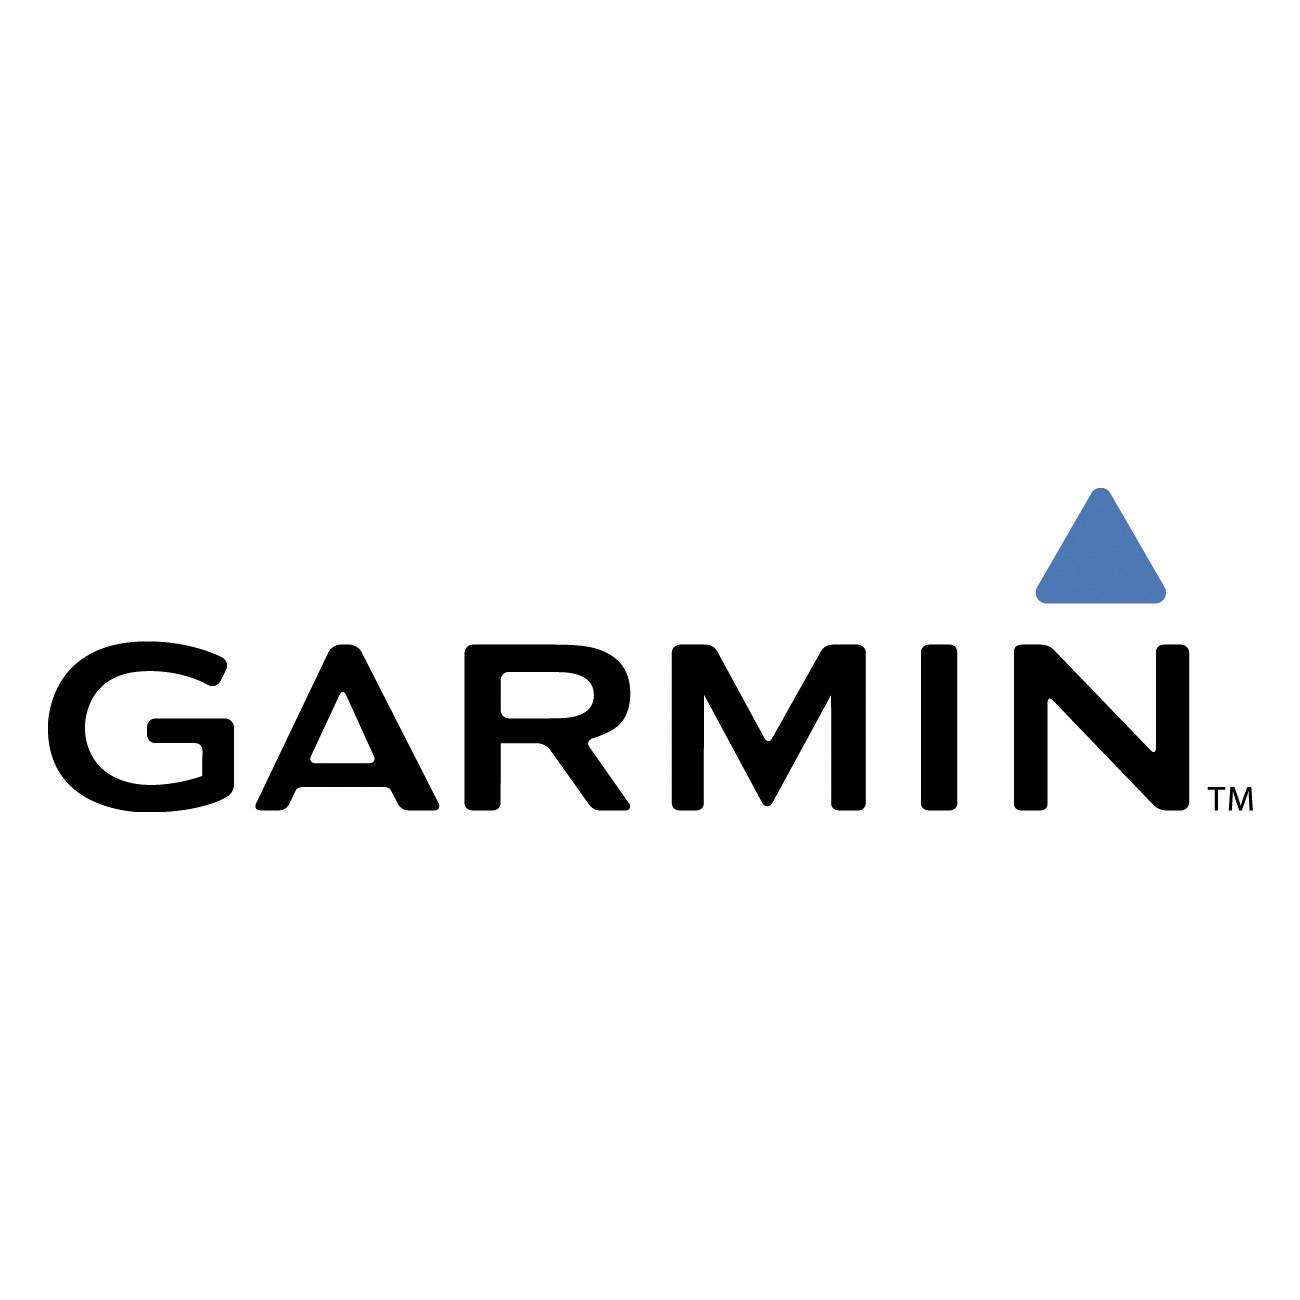 Garmin Logo Wallpaper